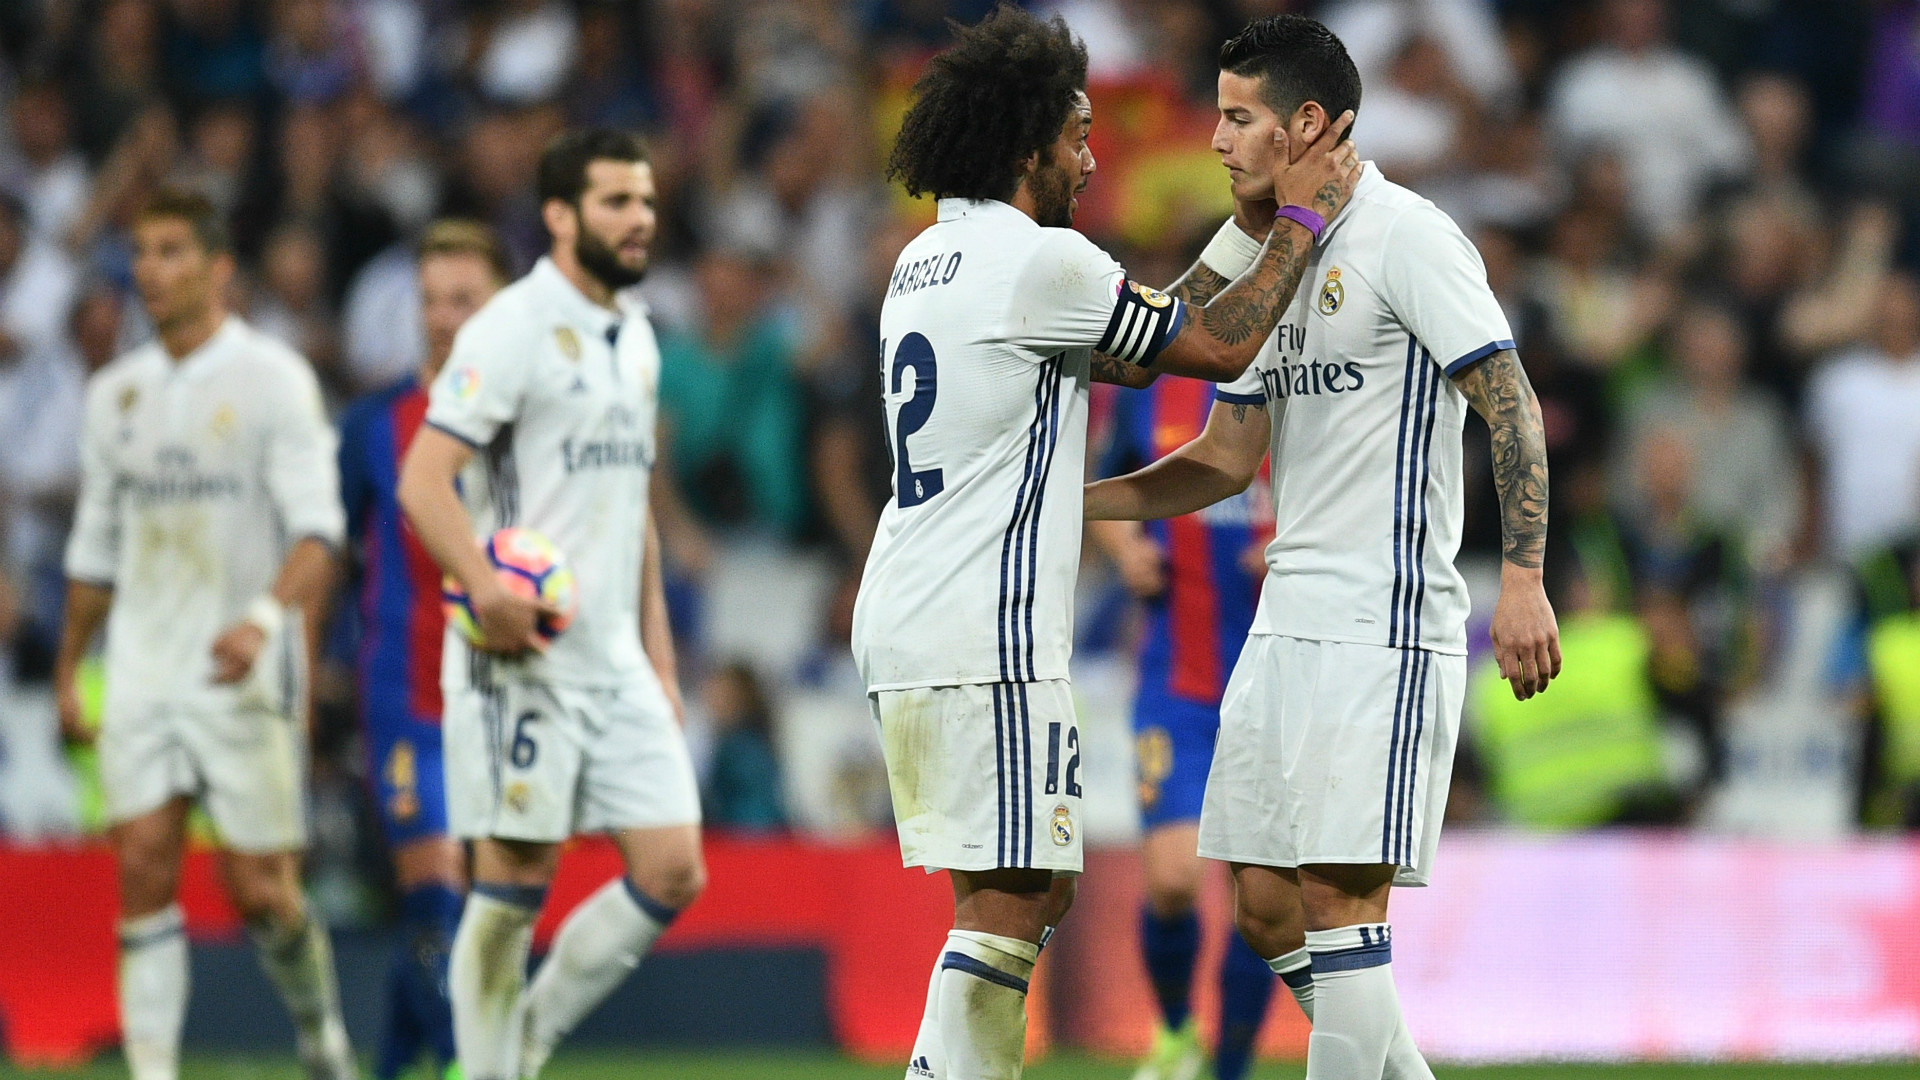 Semana de récord para Messi y Ronaldo - Noticias